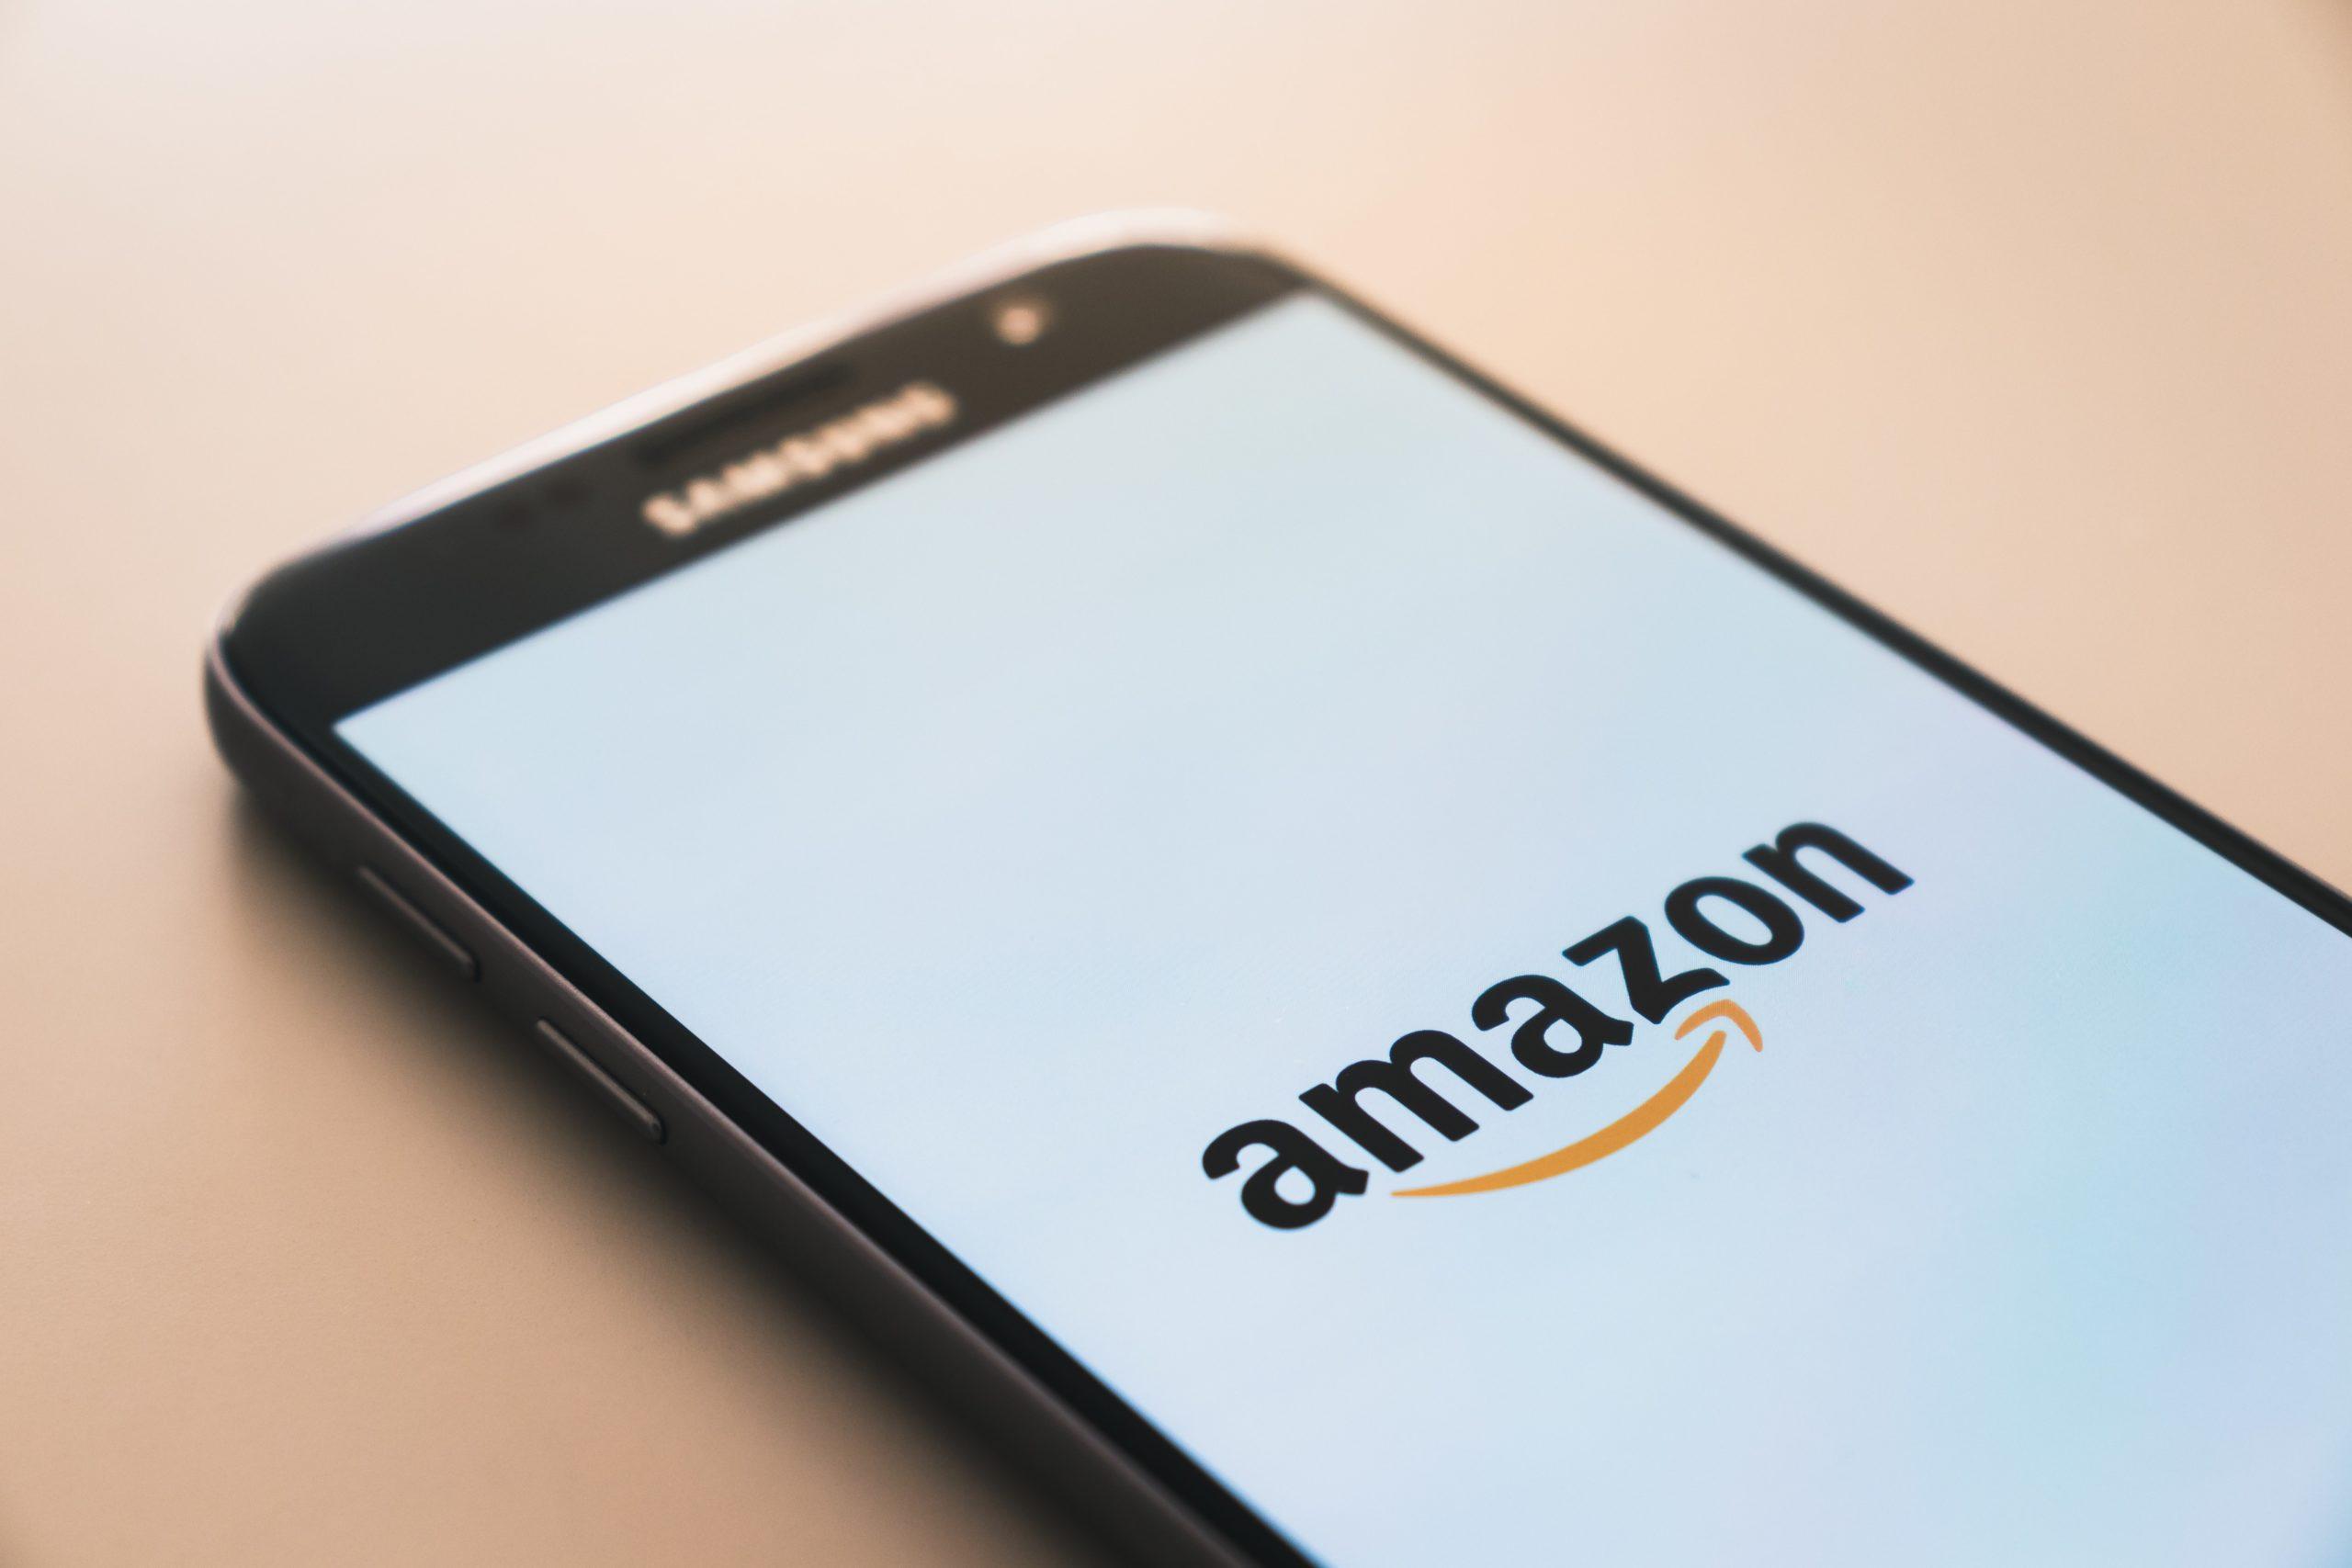 samsung phone with amazon logo on screen